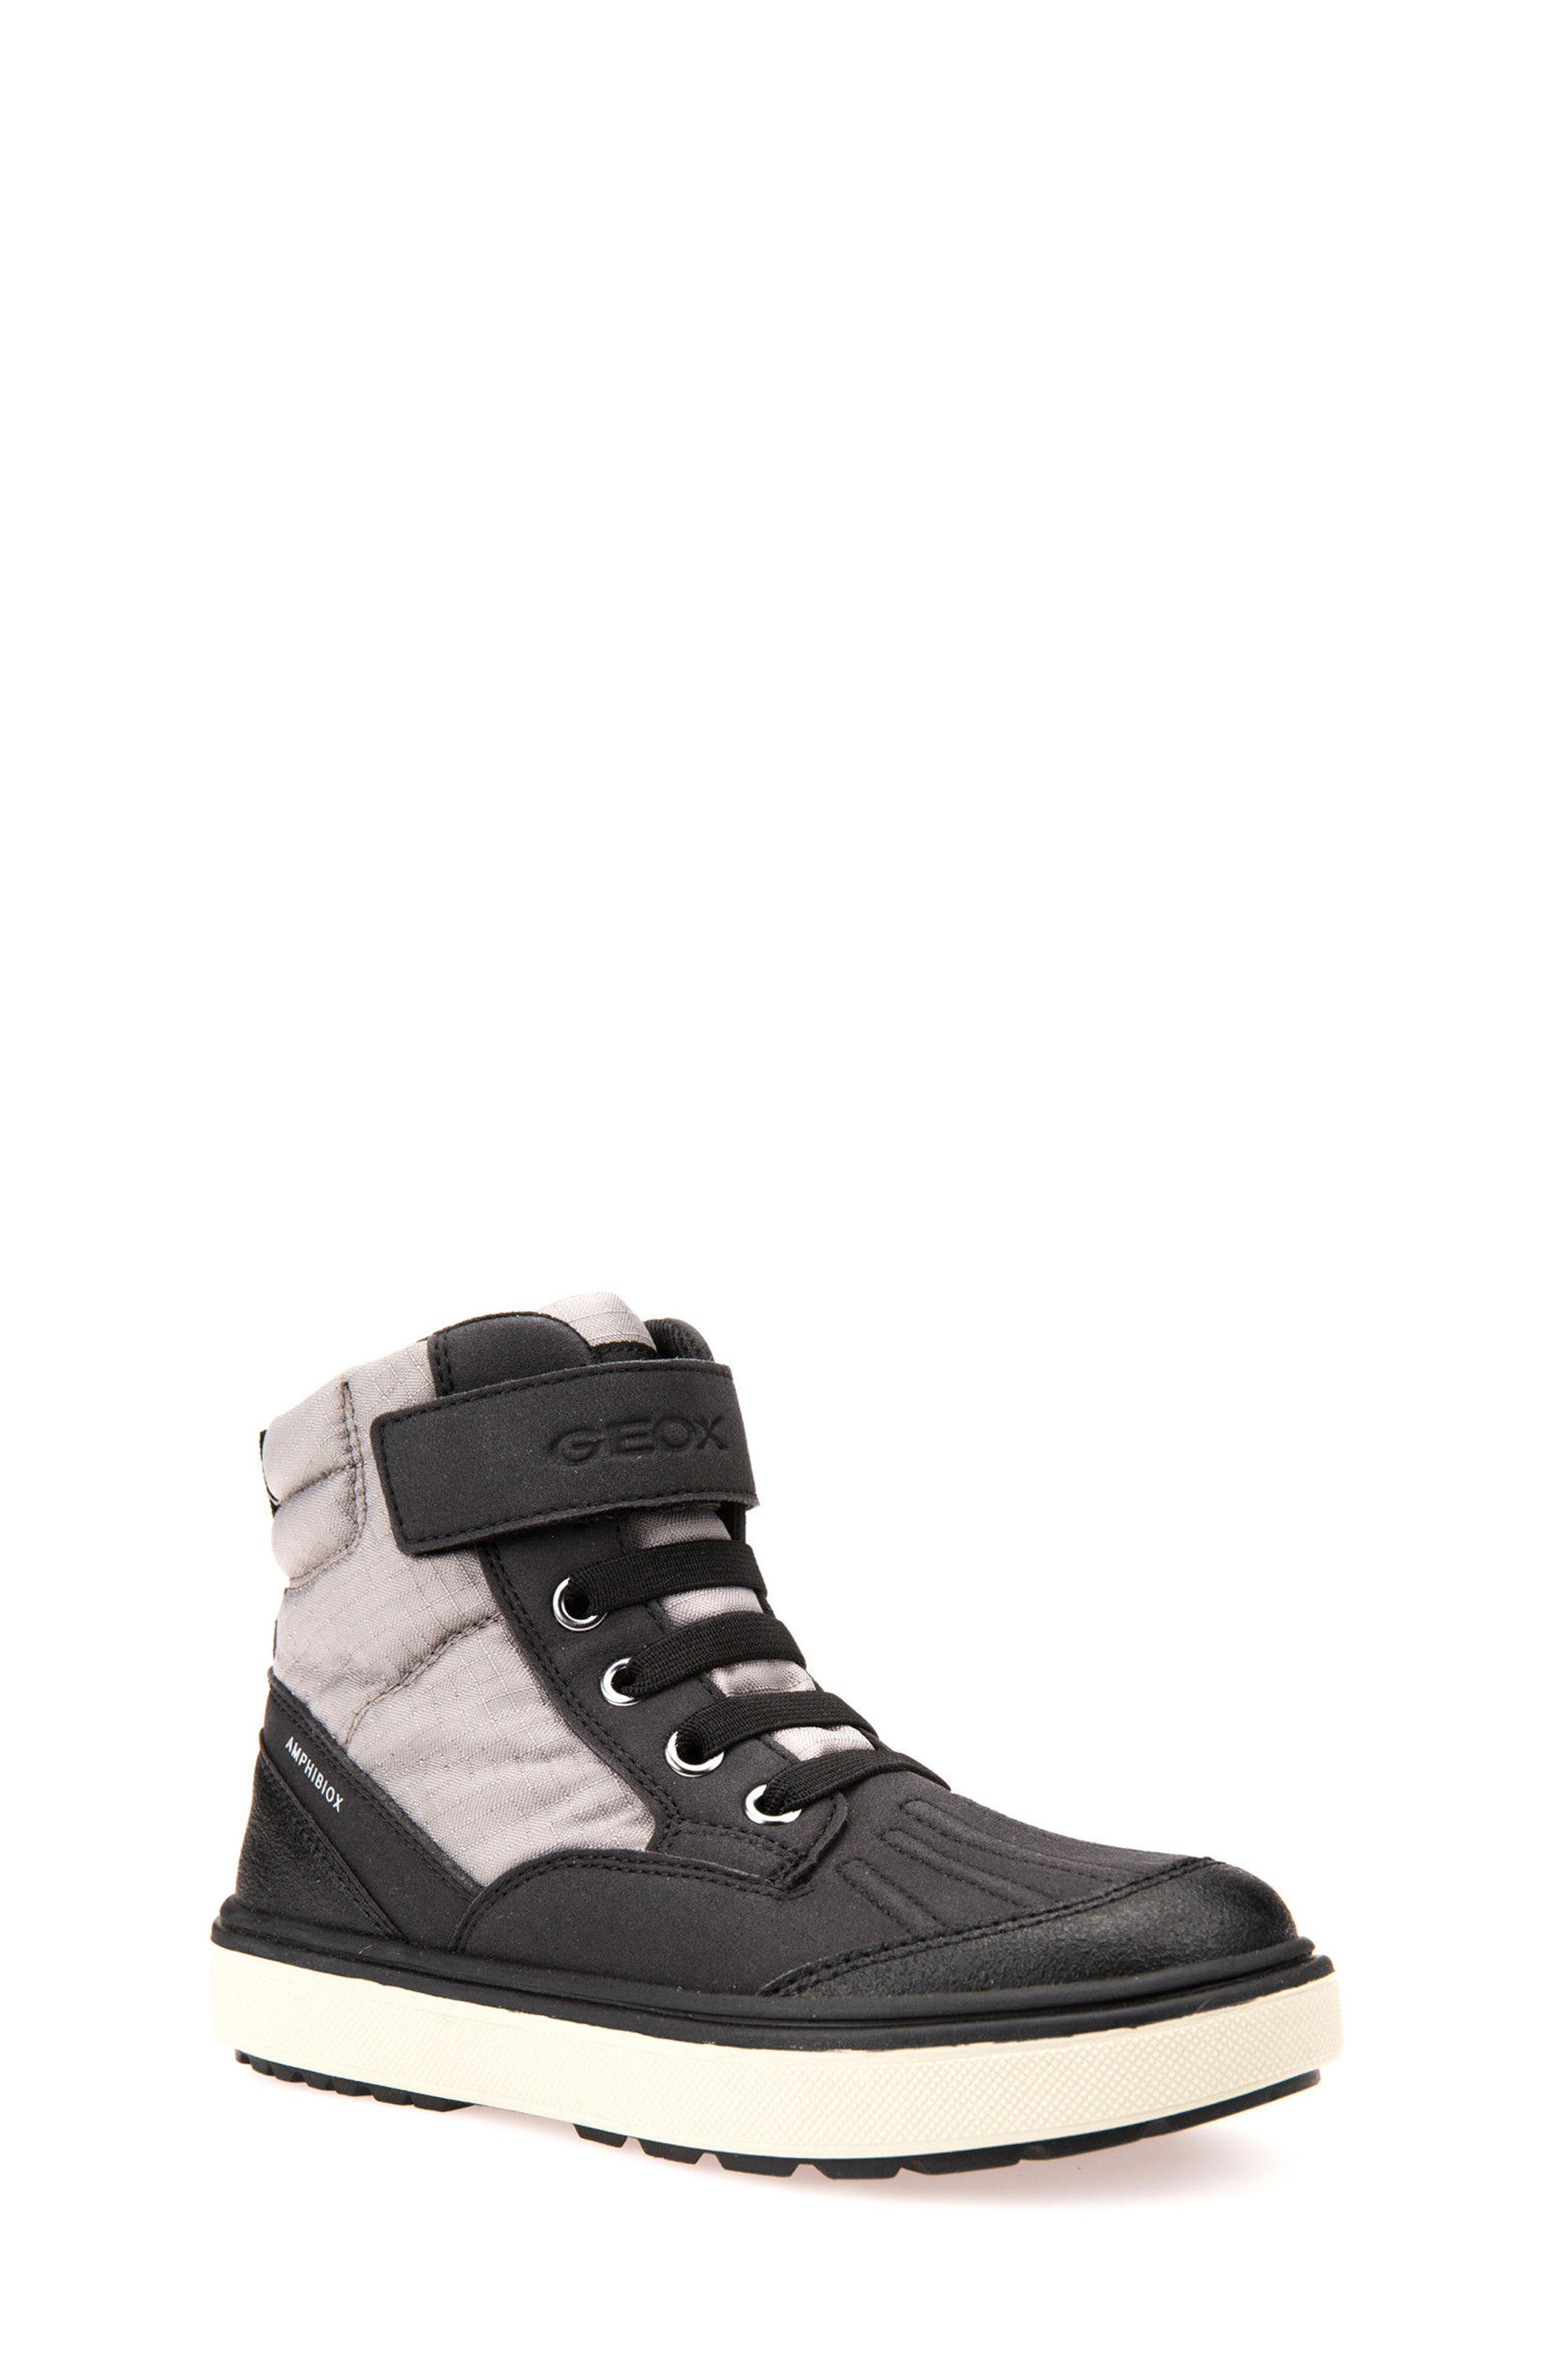 'Mattias - ABX' Amphibiox<sup>®</sup> Waterproof Sneaker,                             Main thumbnail 1, color,                             061